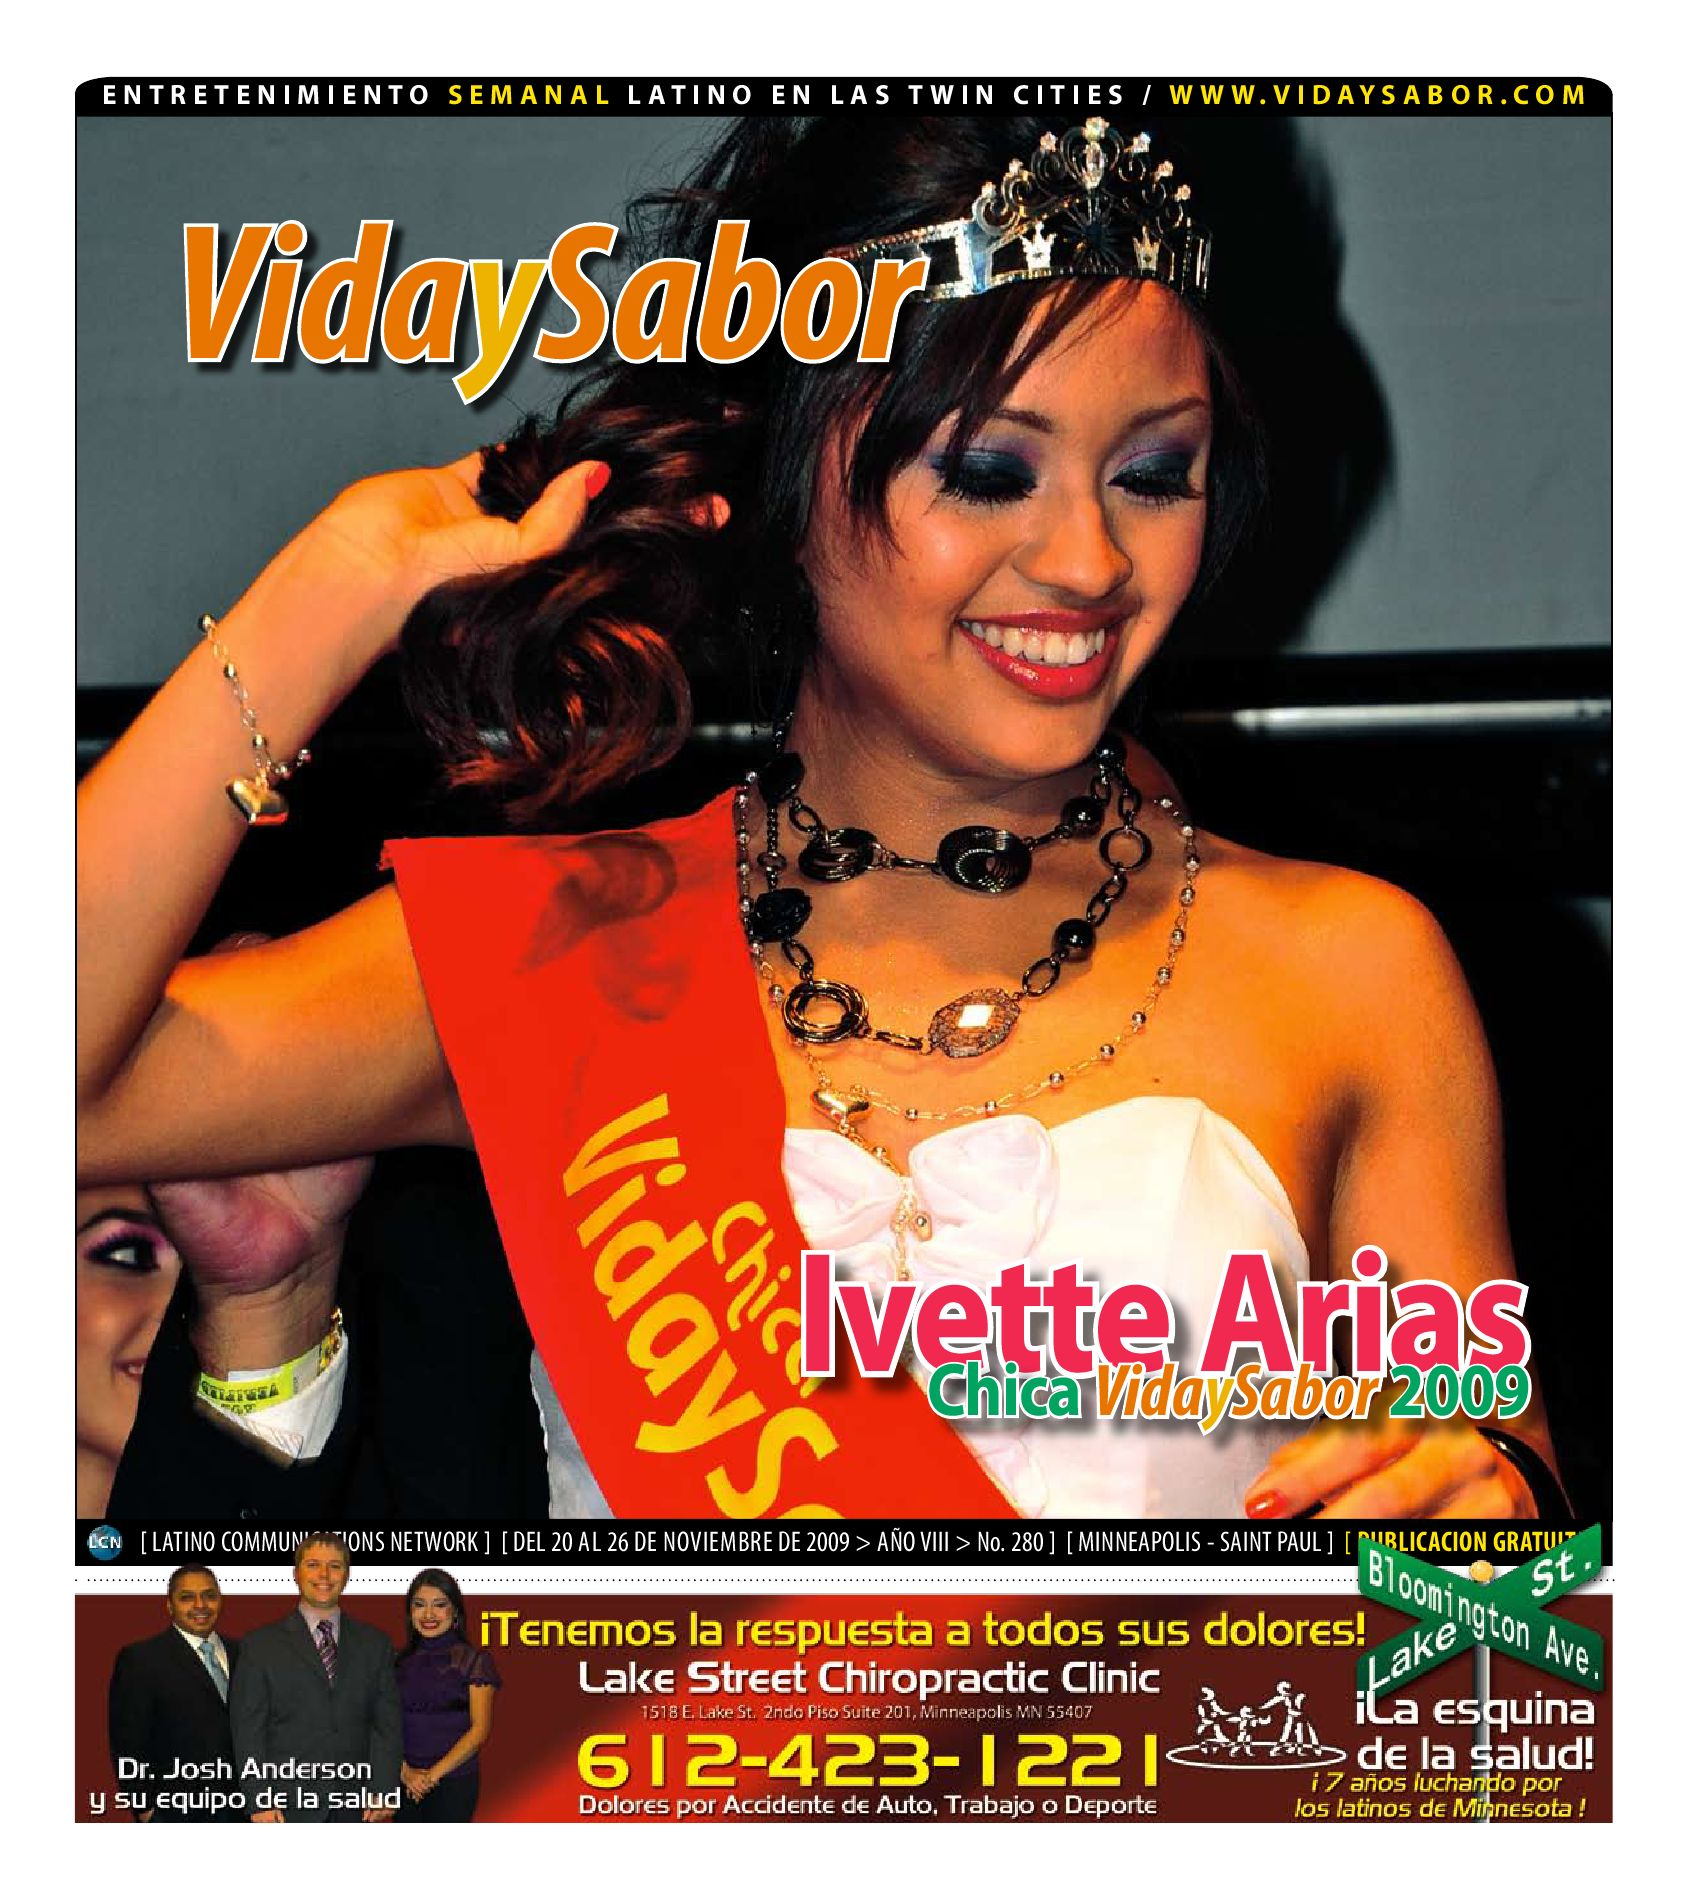 Vida y Sabor 280 by Latino Communications Network LLC - issuu